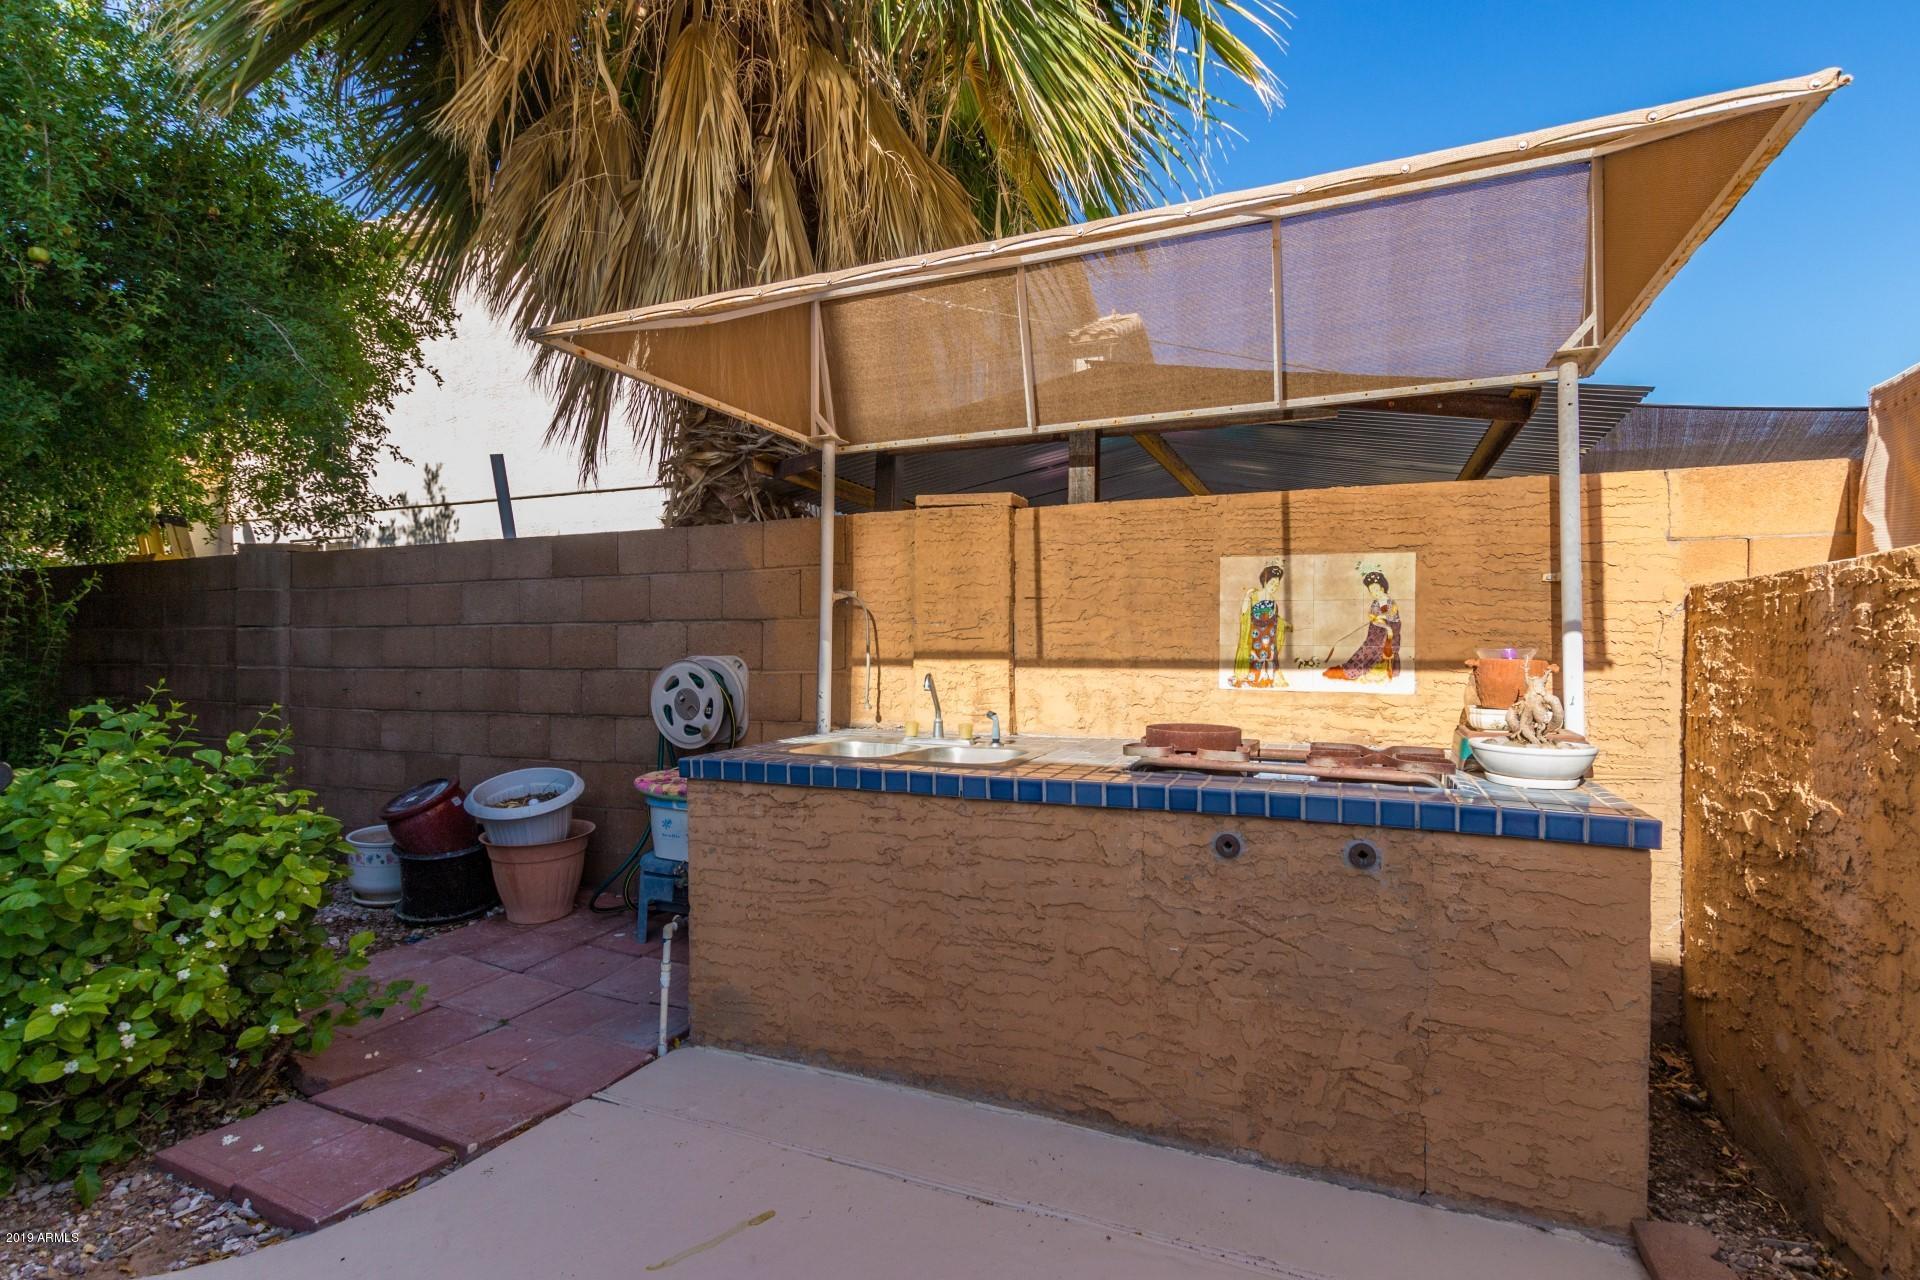 MLS 5936127 1813 W ENCINAS Street, Gilbert, AZ 85233 Golf Course Lots